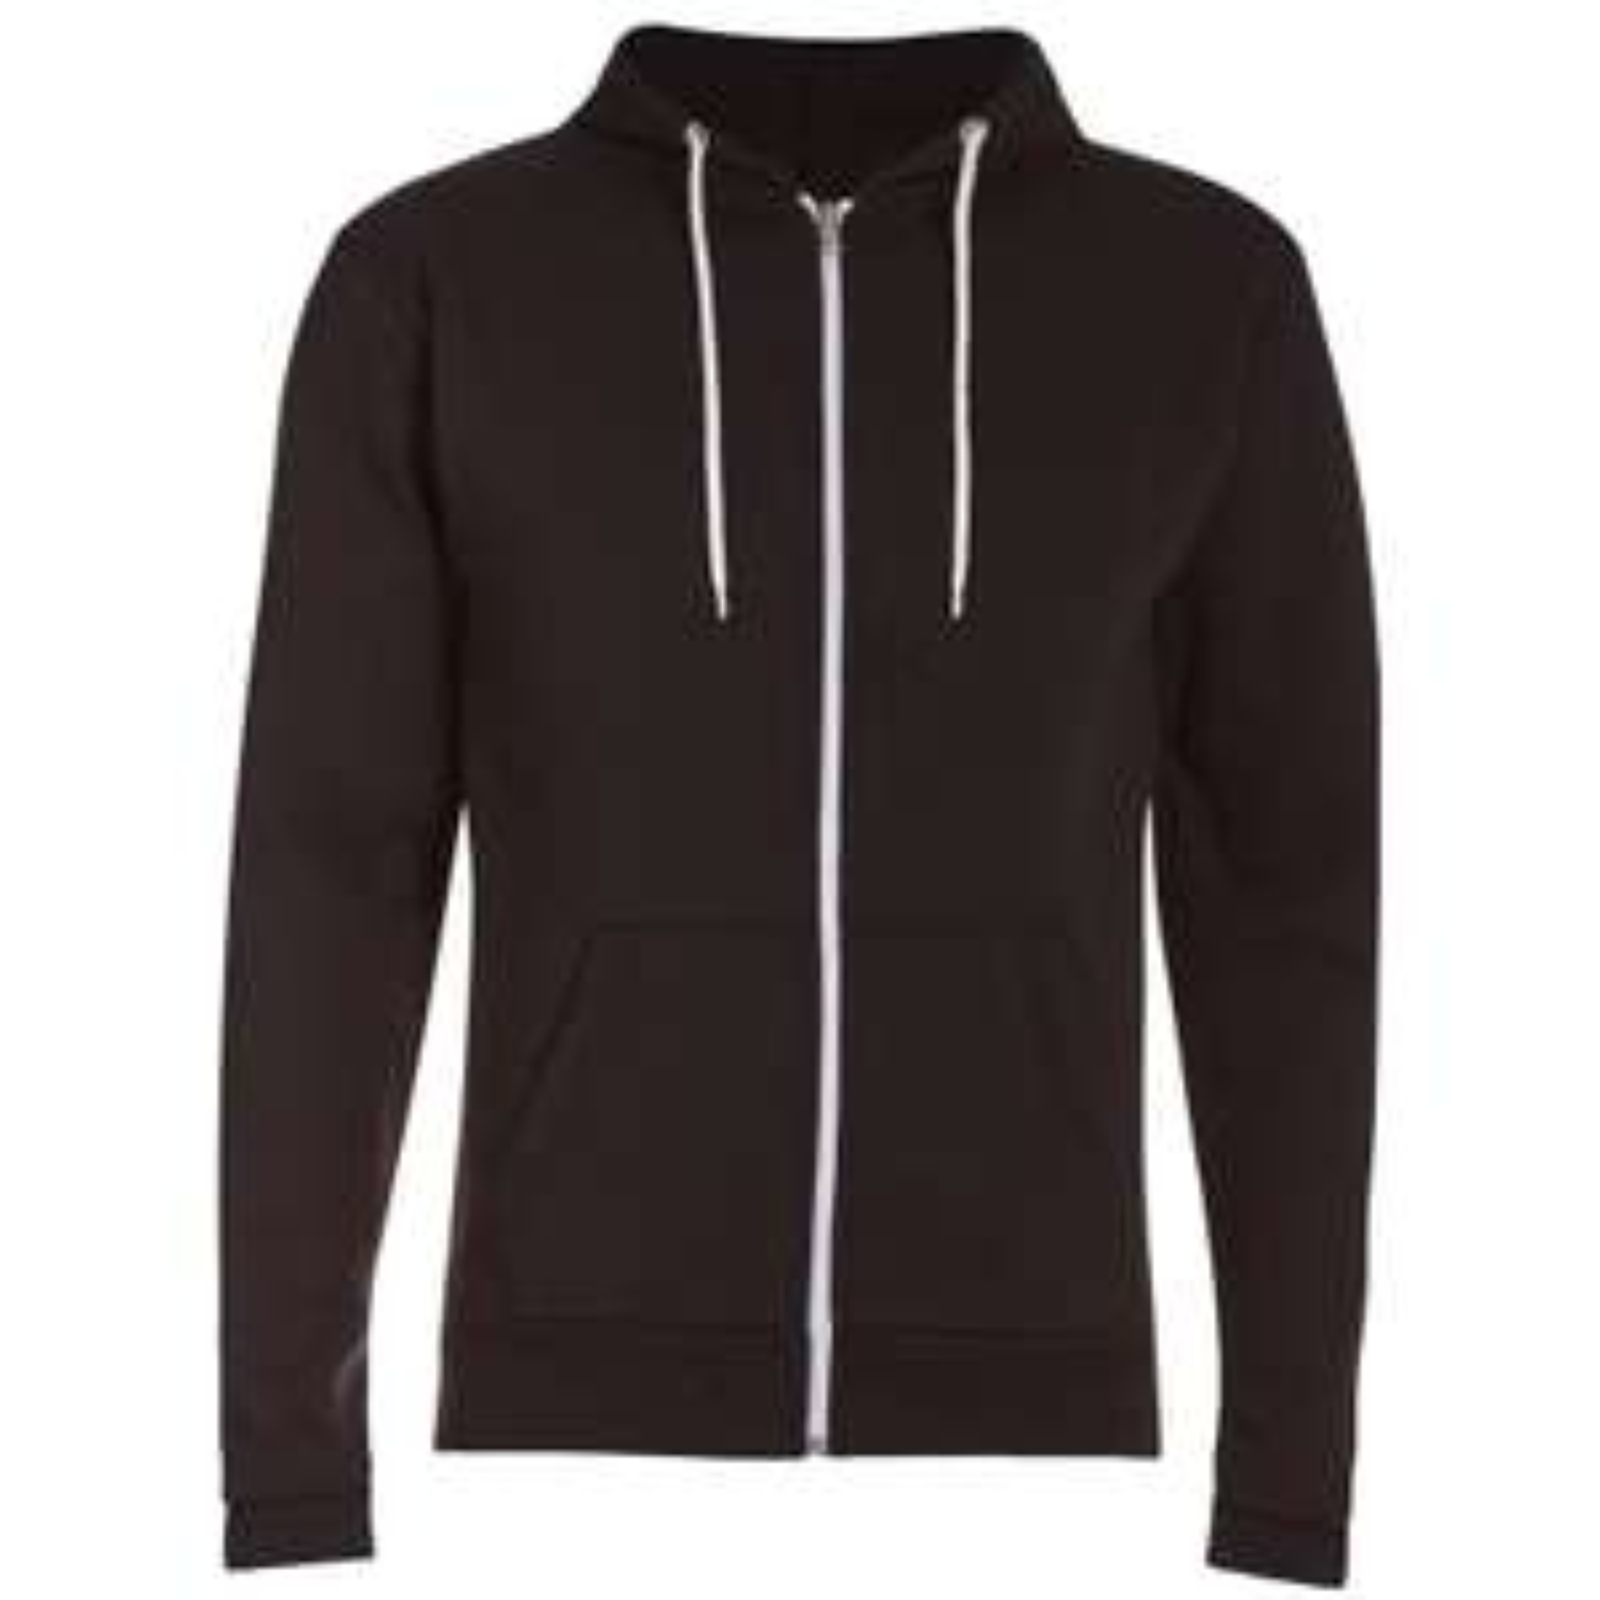 Advocate Men's Berkley Zip Through Hoody - Black & Navy £8.48 delivered @ Zavvi